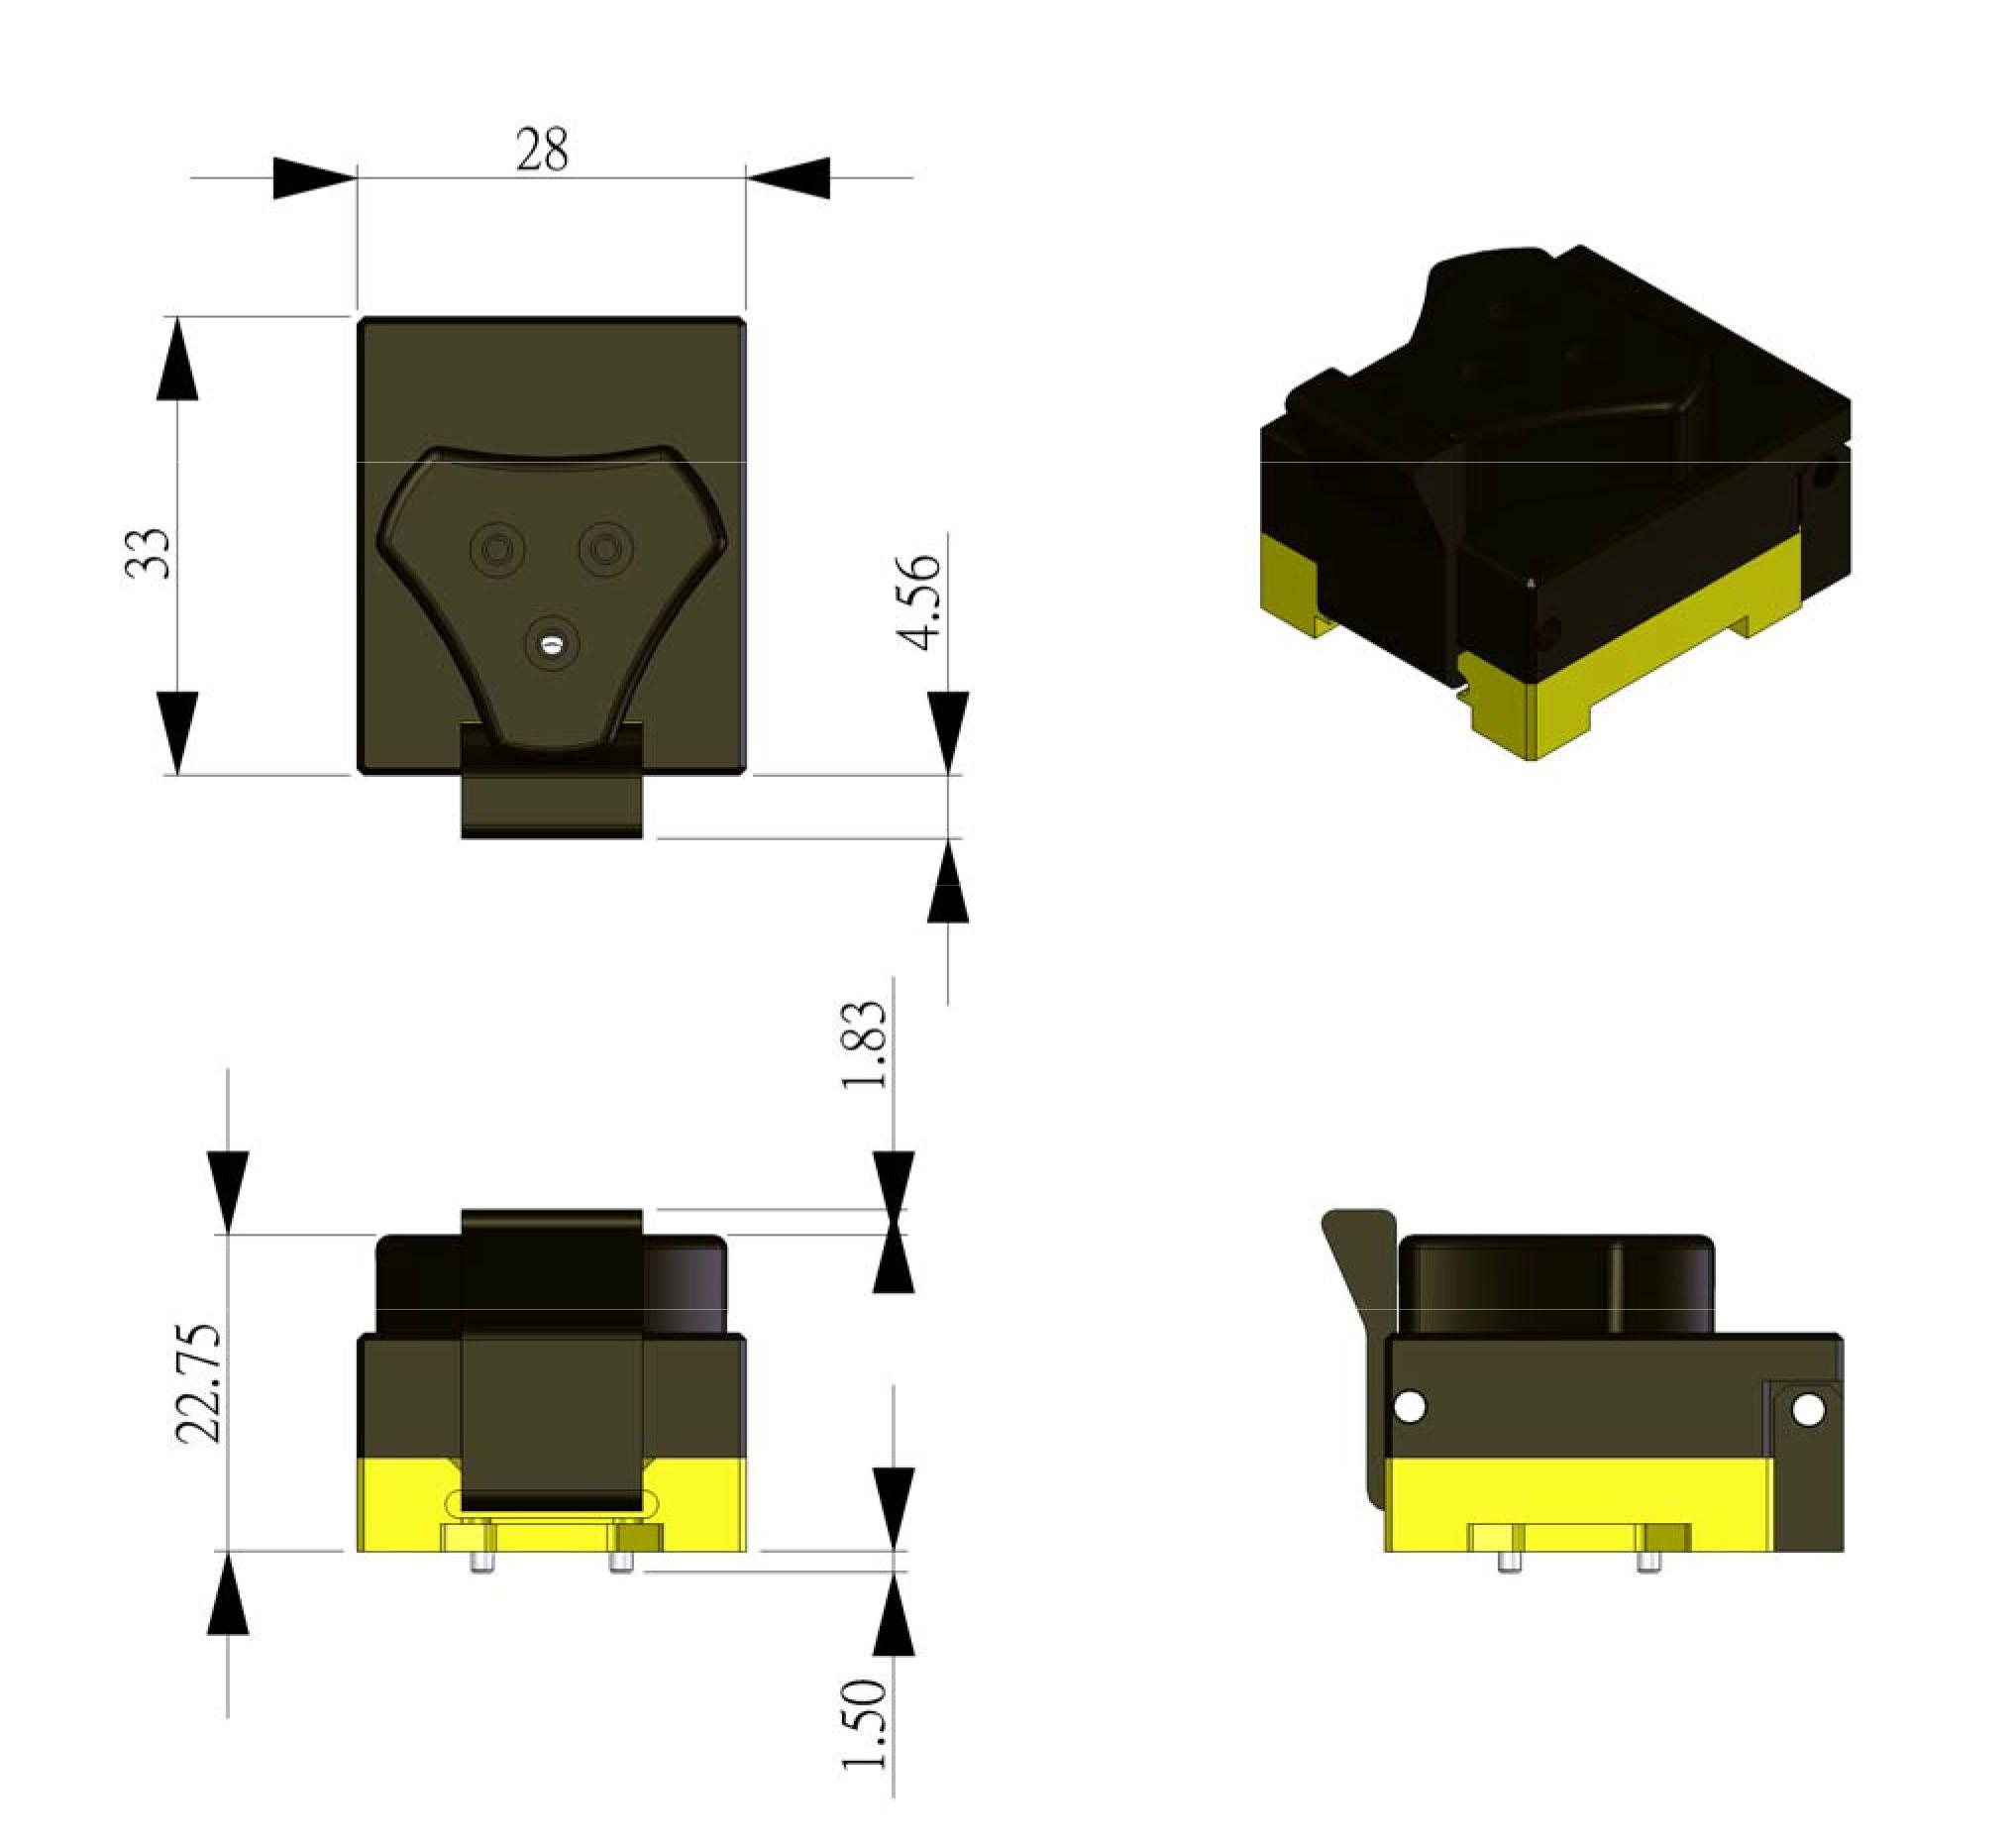 TQFN 014018-10L-040組合件 - 圖頁1